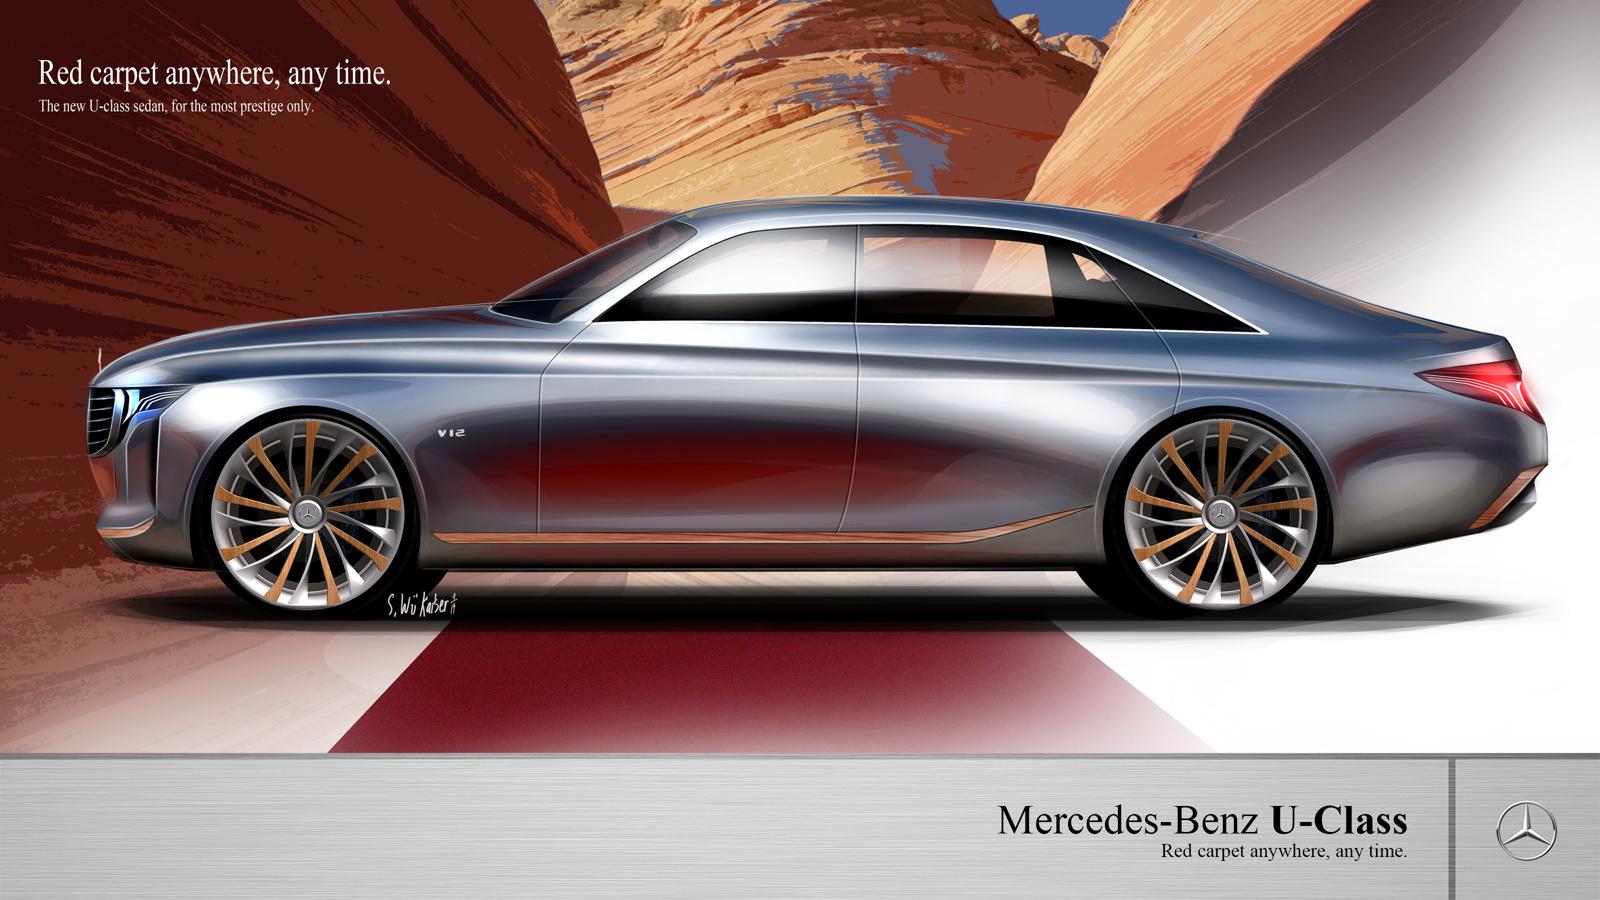 Mercedes-Benz U-Class Concept Redefines Luxury as an ...